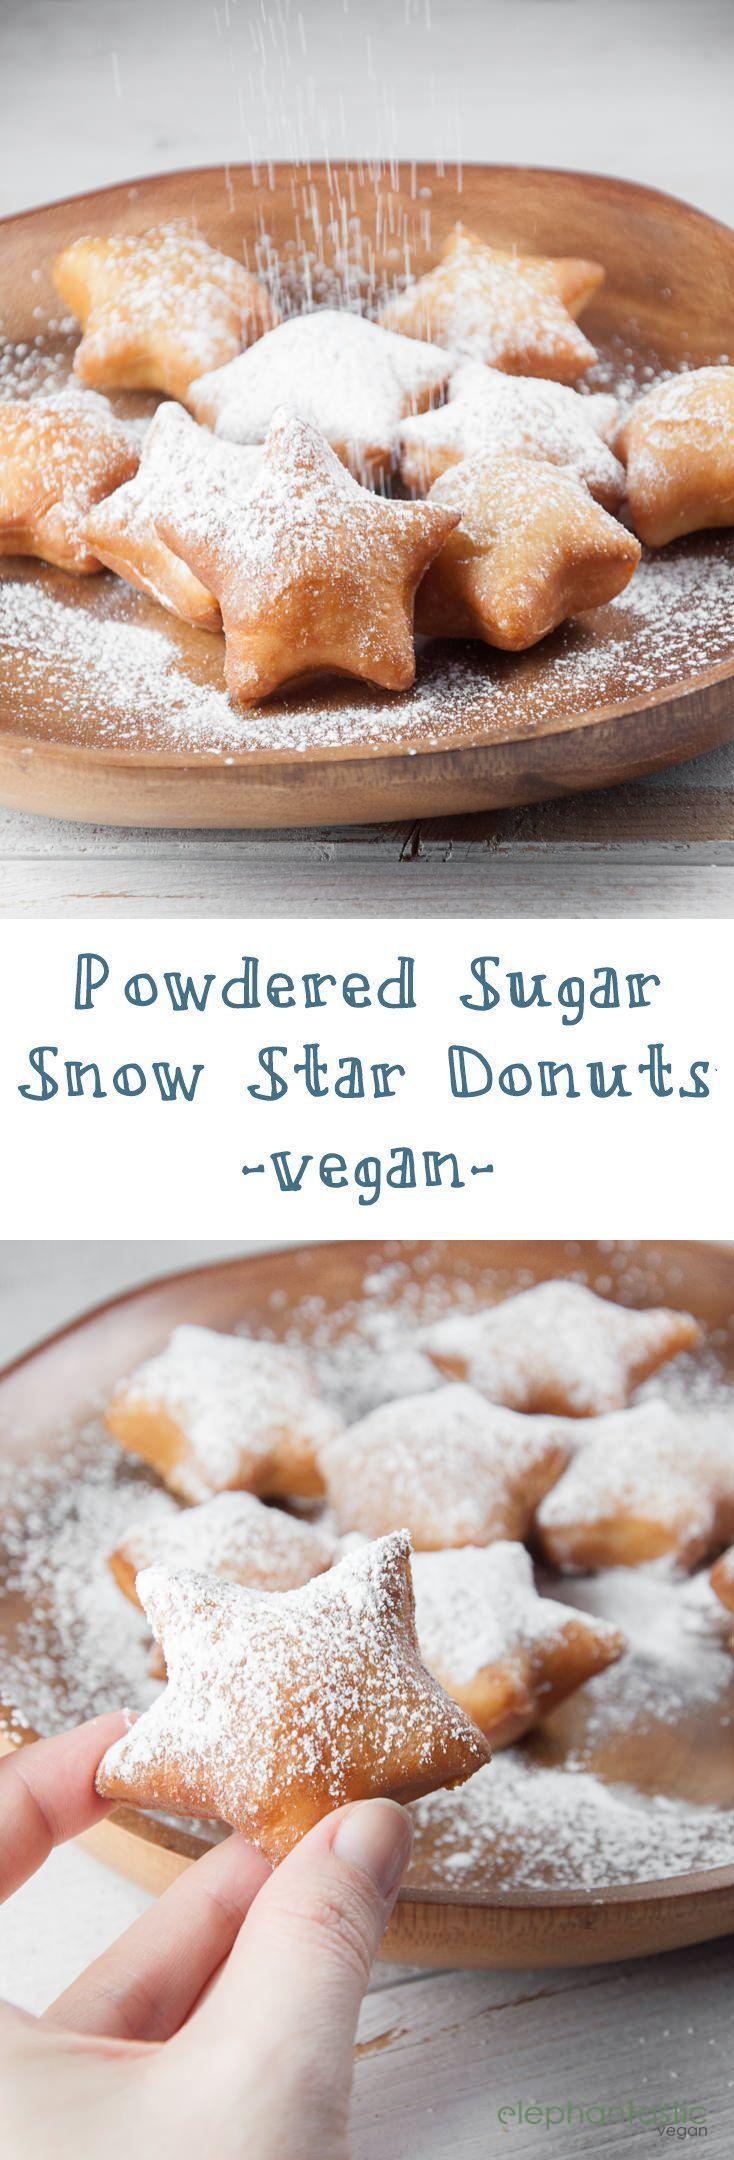 Powdered Sugar Snow Star Donuts (vegan) | http://ElephantasticVegan.com